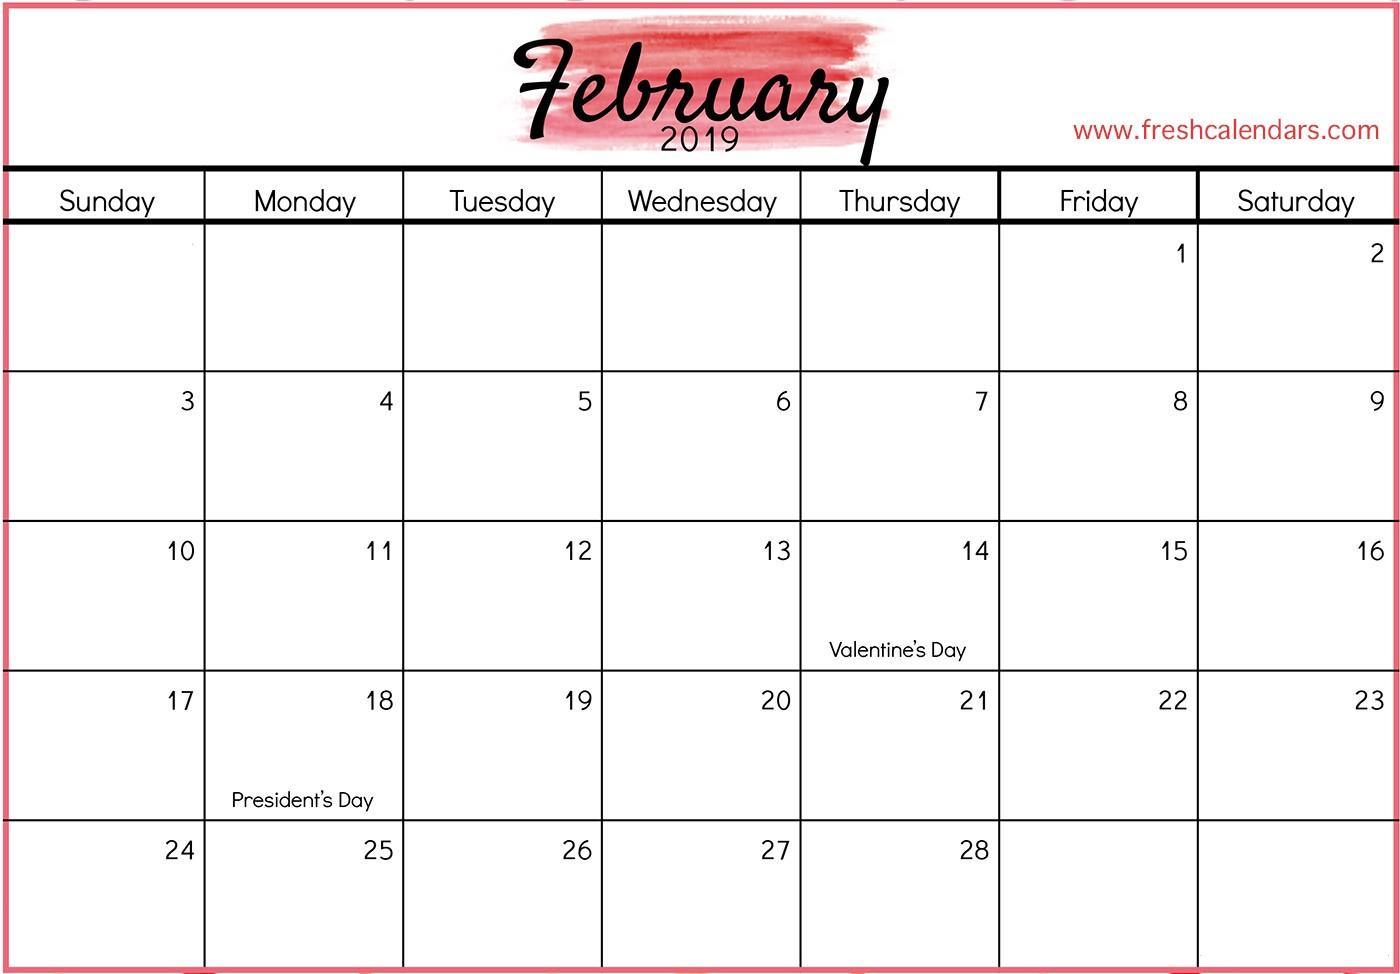 Calendar for February 2019 Printable Printable February 2019 Calendar Fresh Calendars